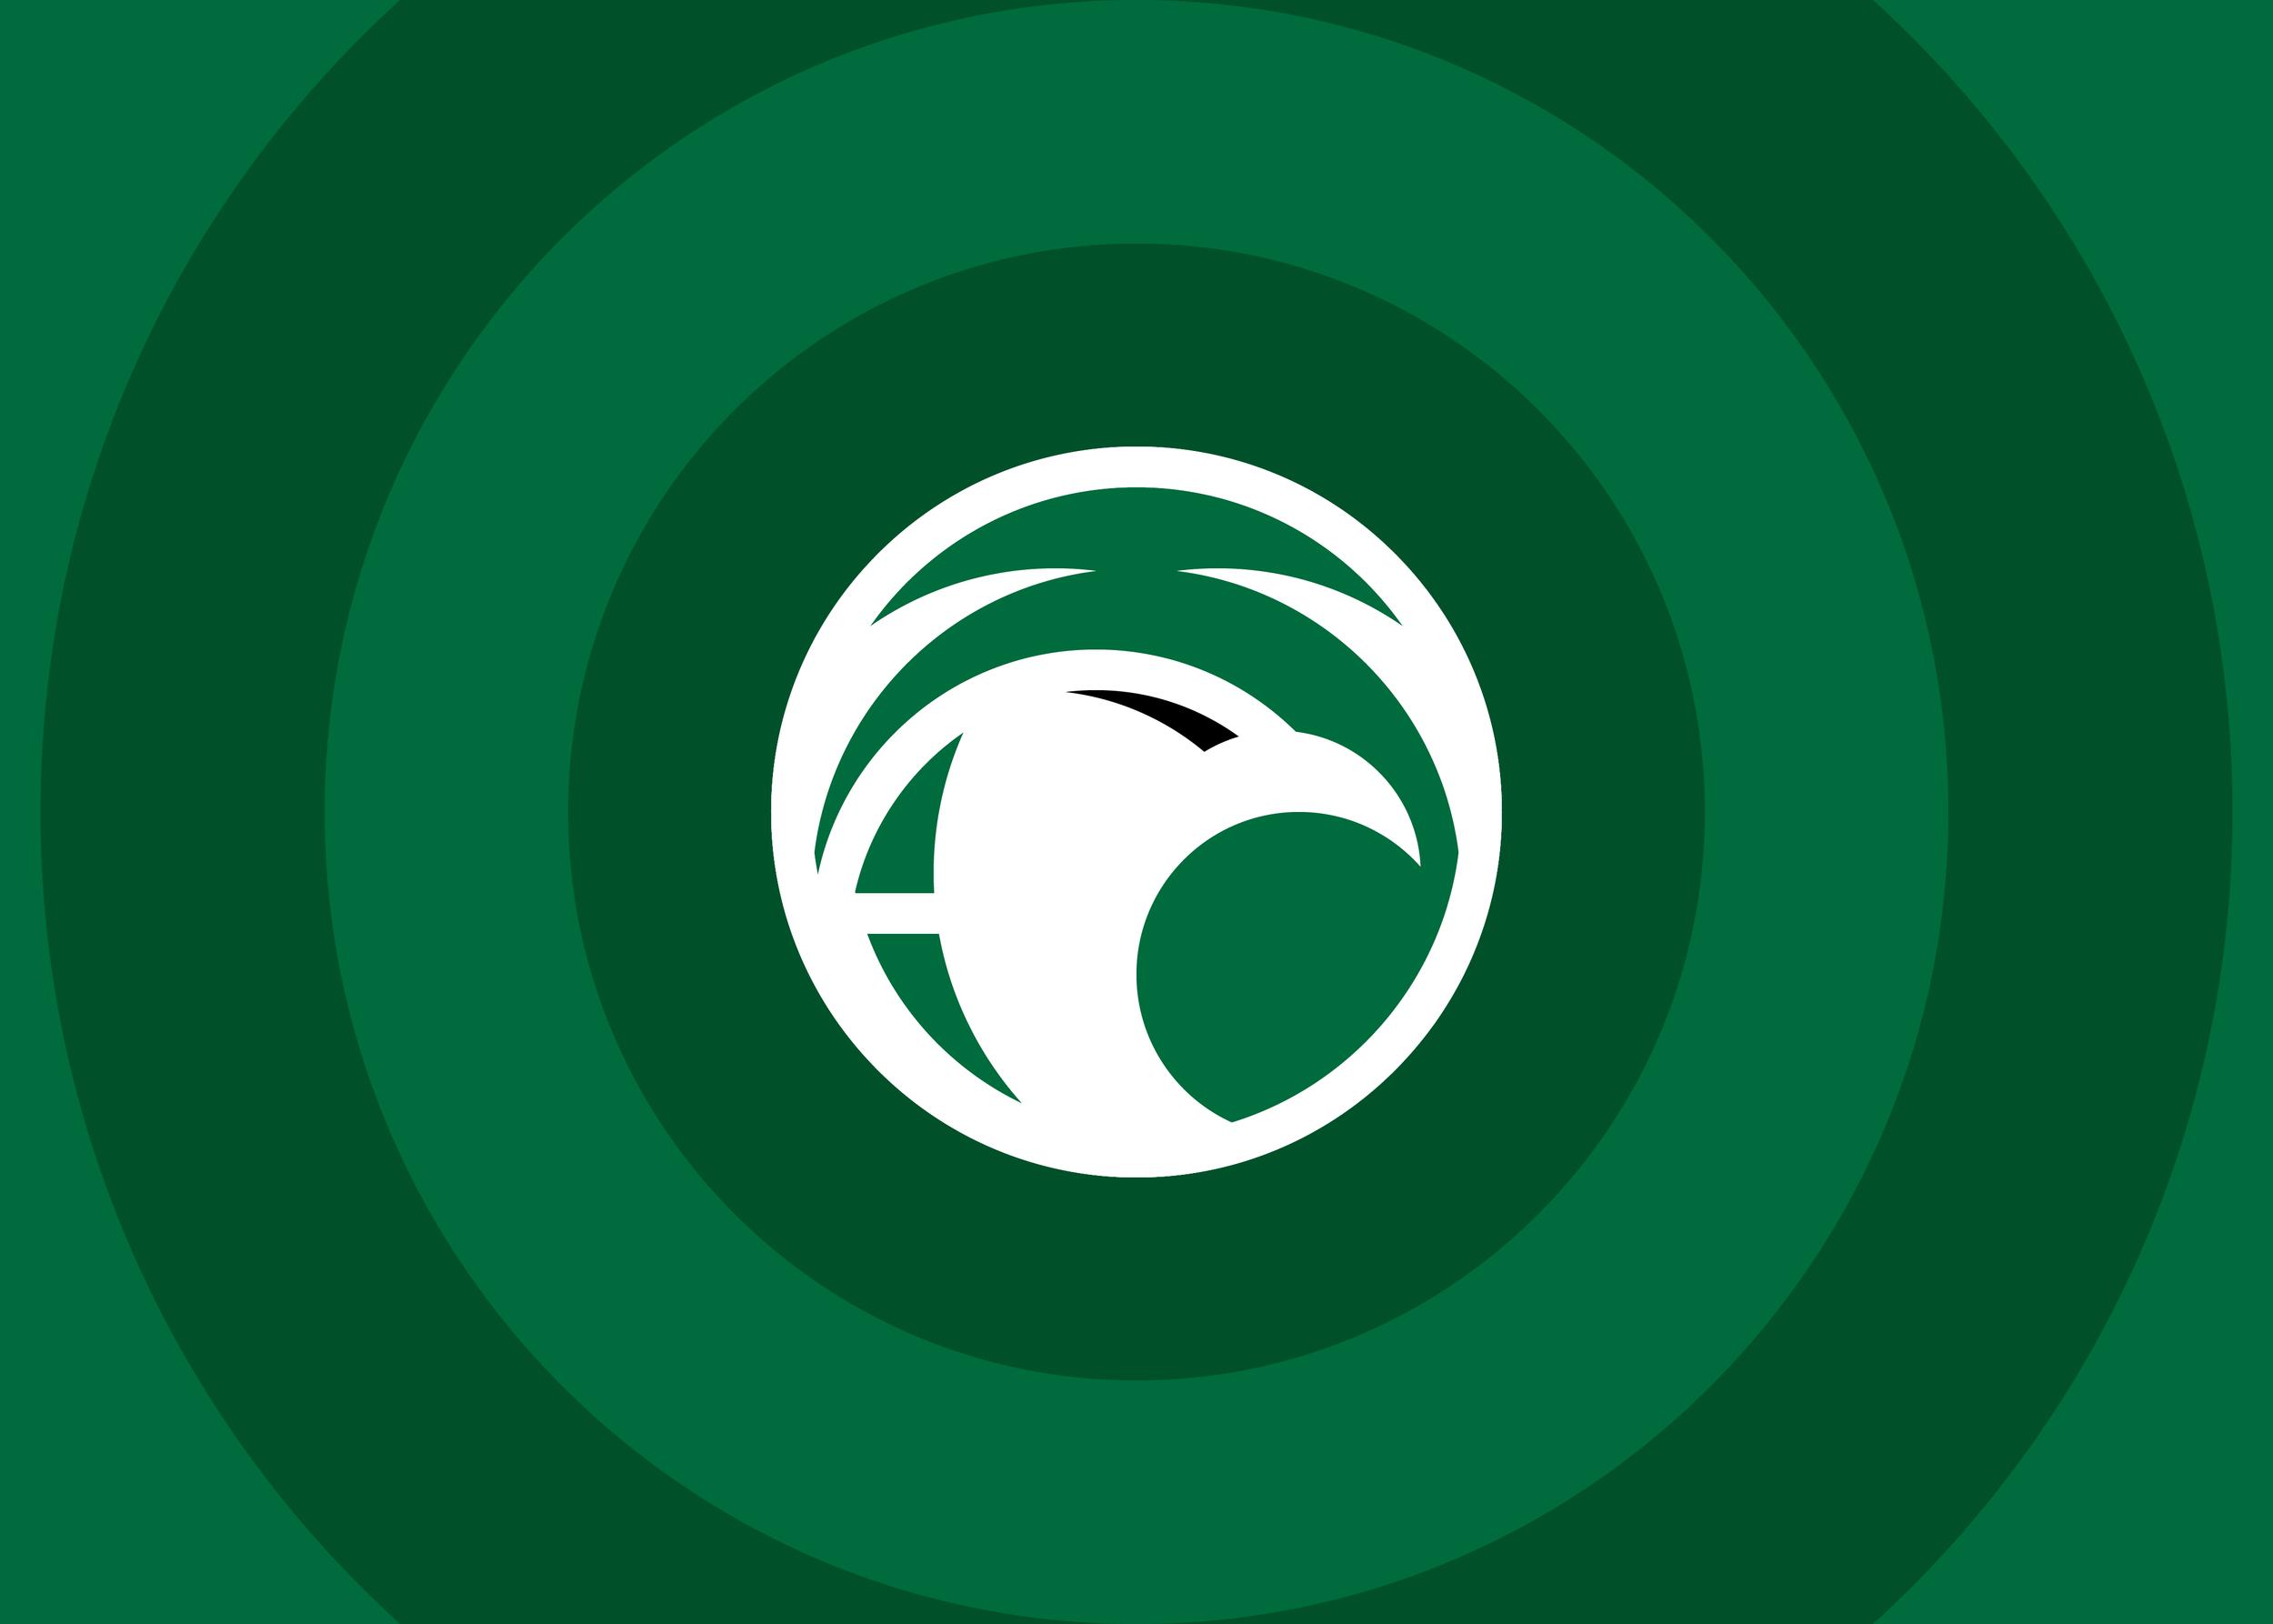 Saudi-Arabia-Geometric-World-Cup-Football-Badge-01-Logo-Design-Freelance-Kent.png